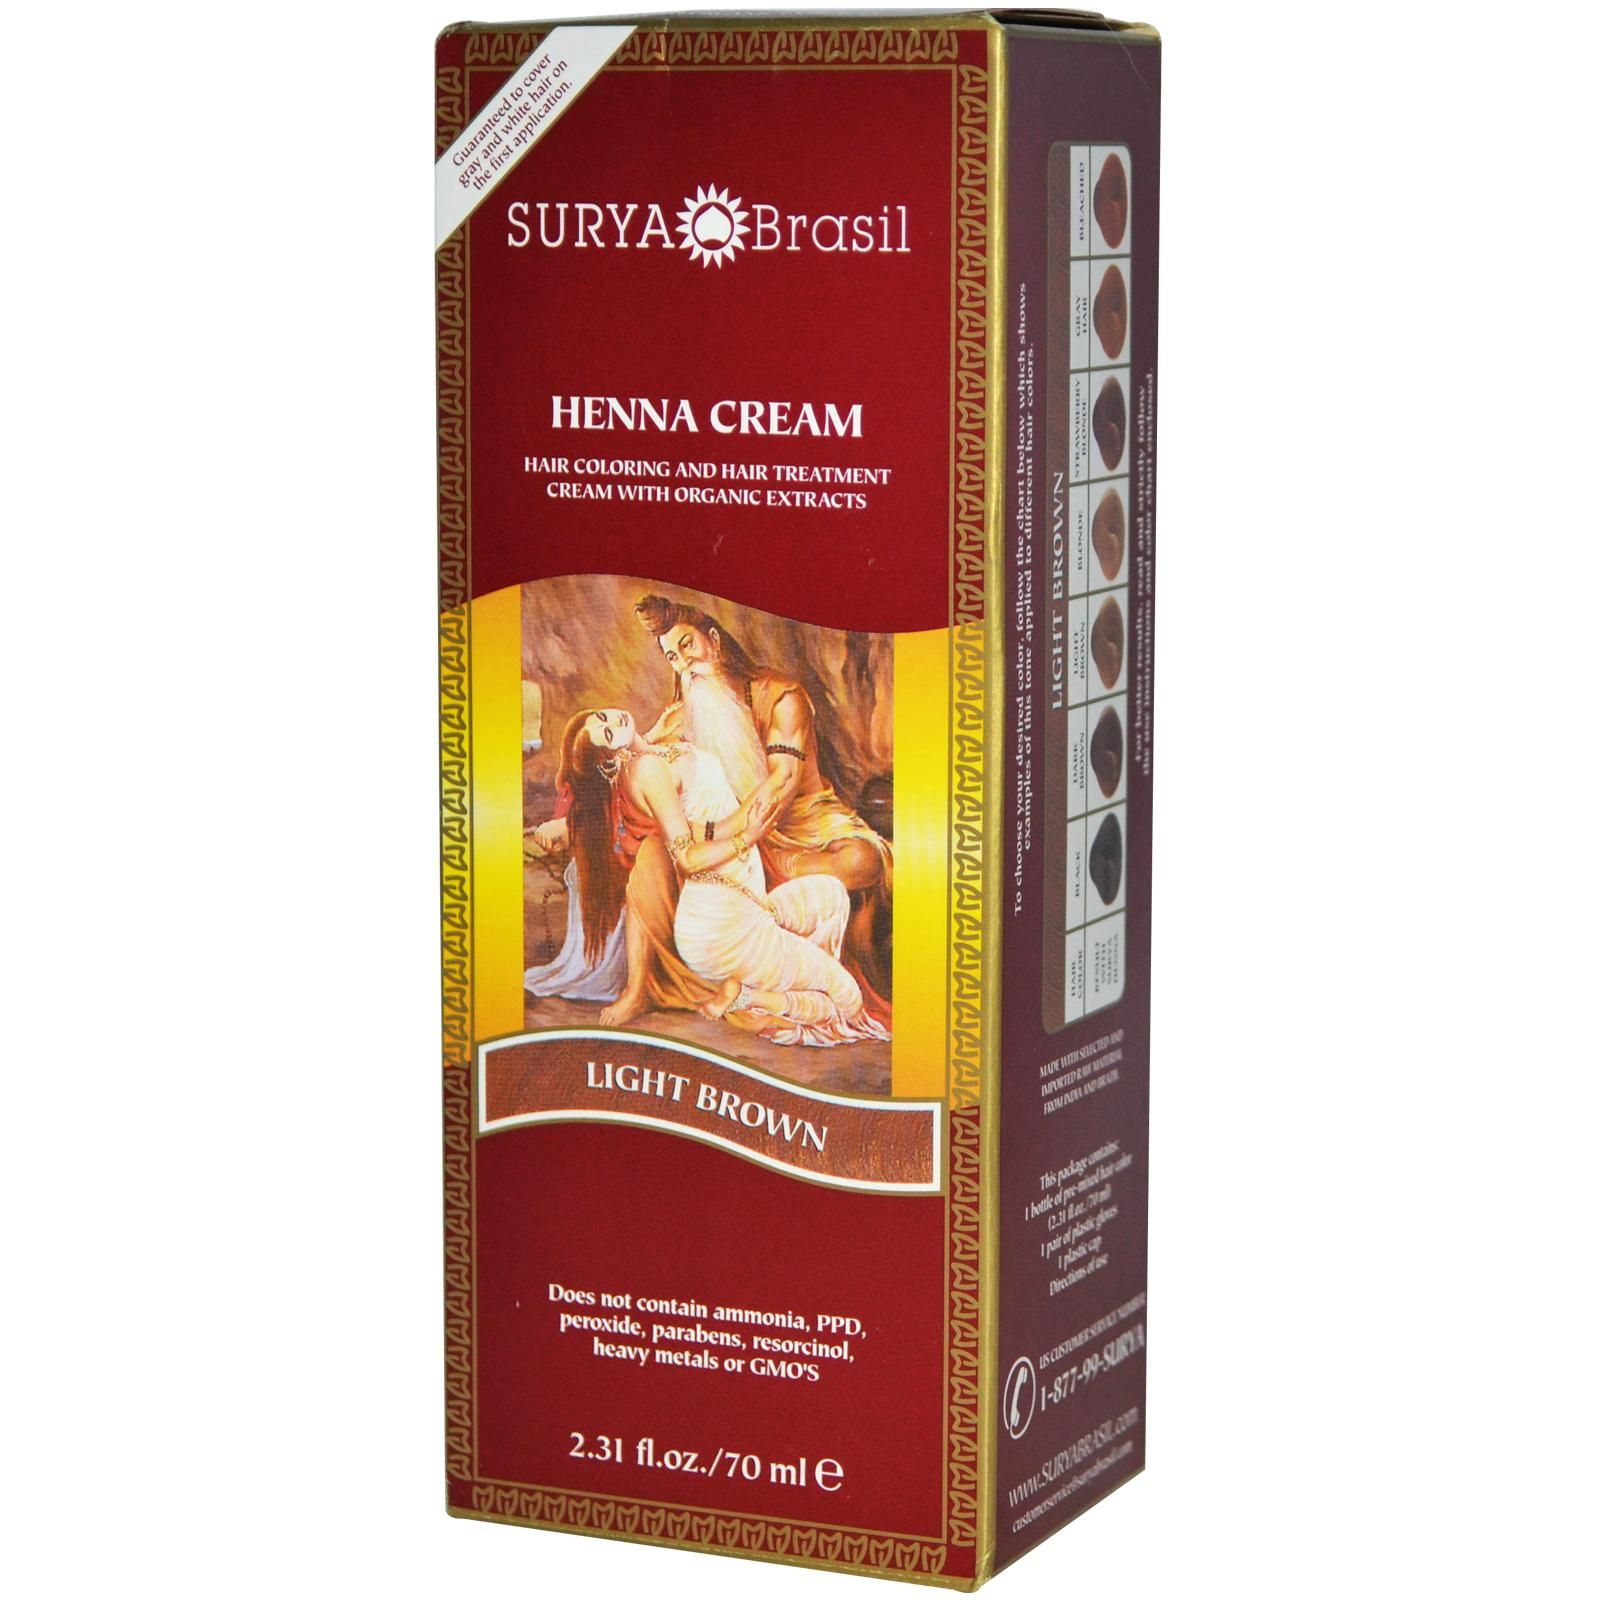 4d50b4bcc07cb Surya Henna, Henna Cream, Hair Coloring & Hair Treatment, Light Brown, 2.31  fl oz (70 ml) - iHerb.com